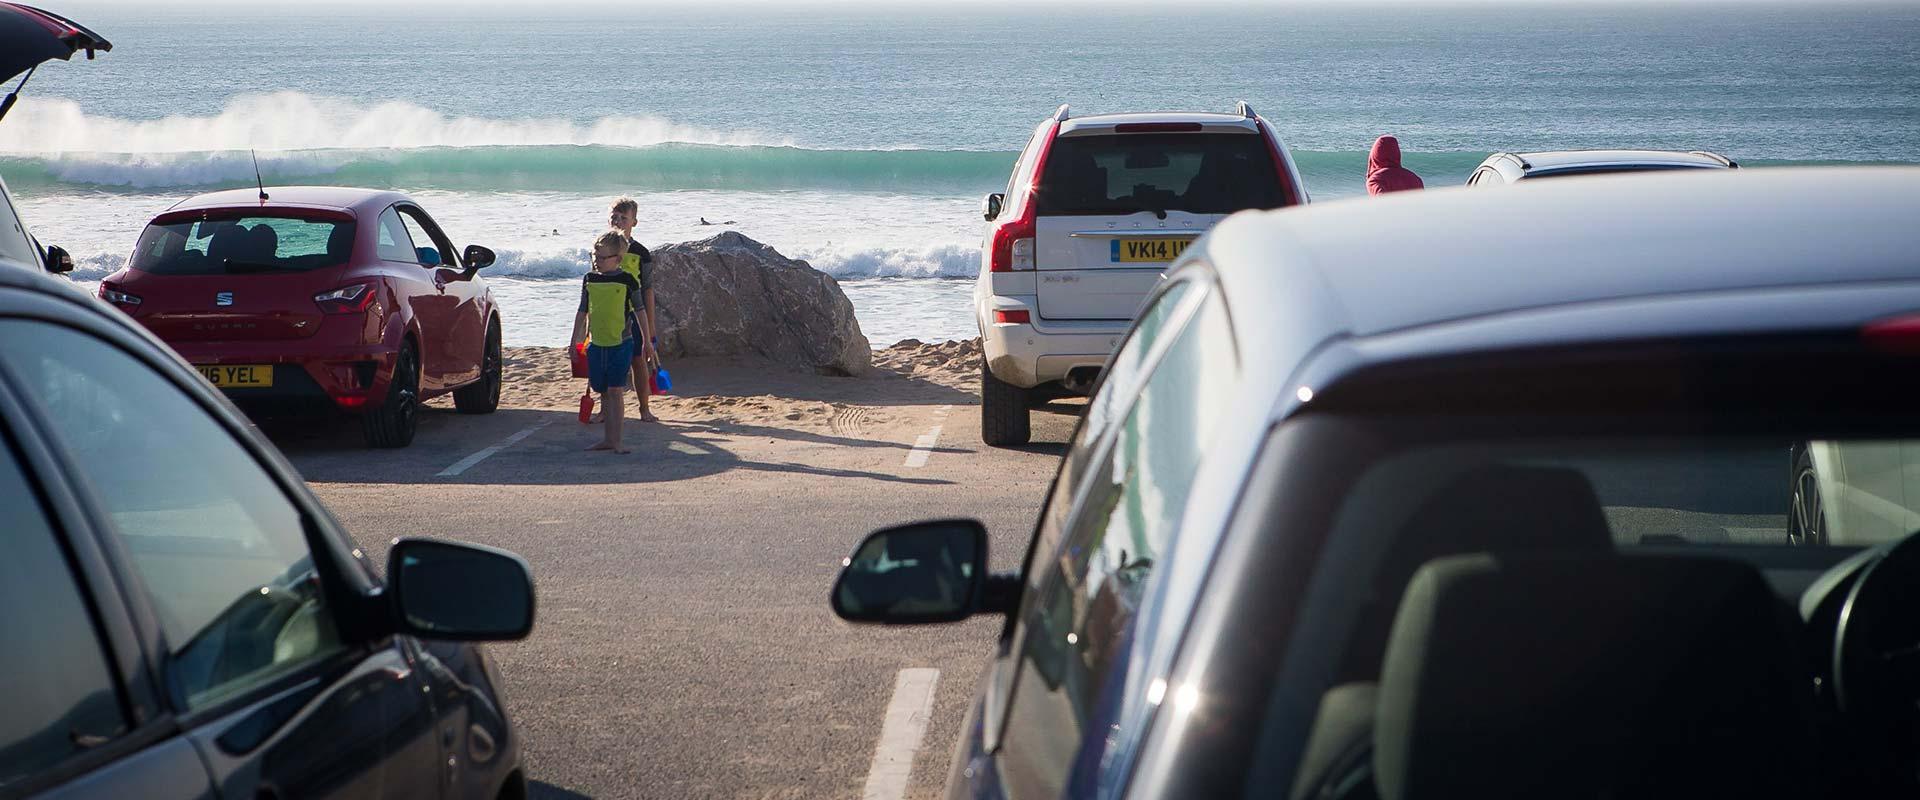 Fistral Beach Car Park